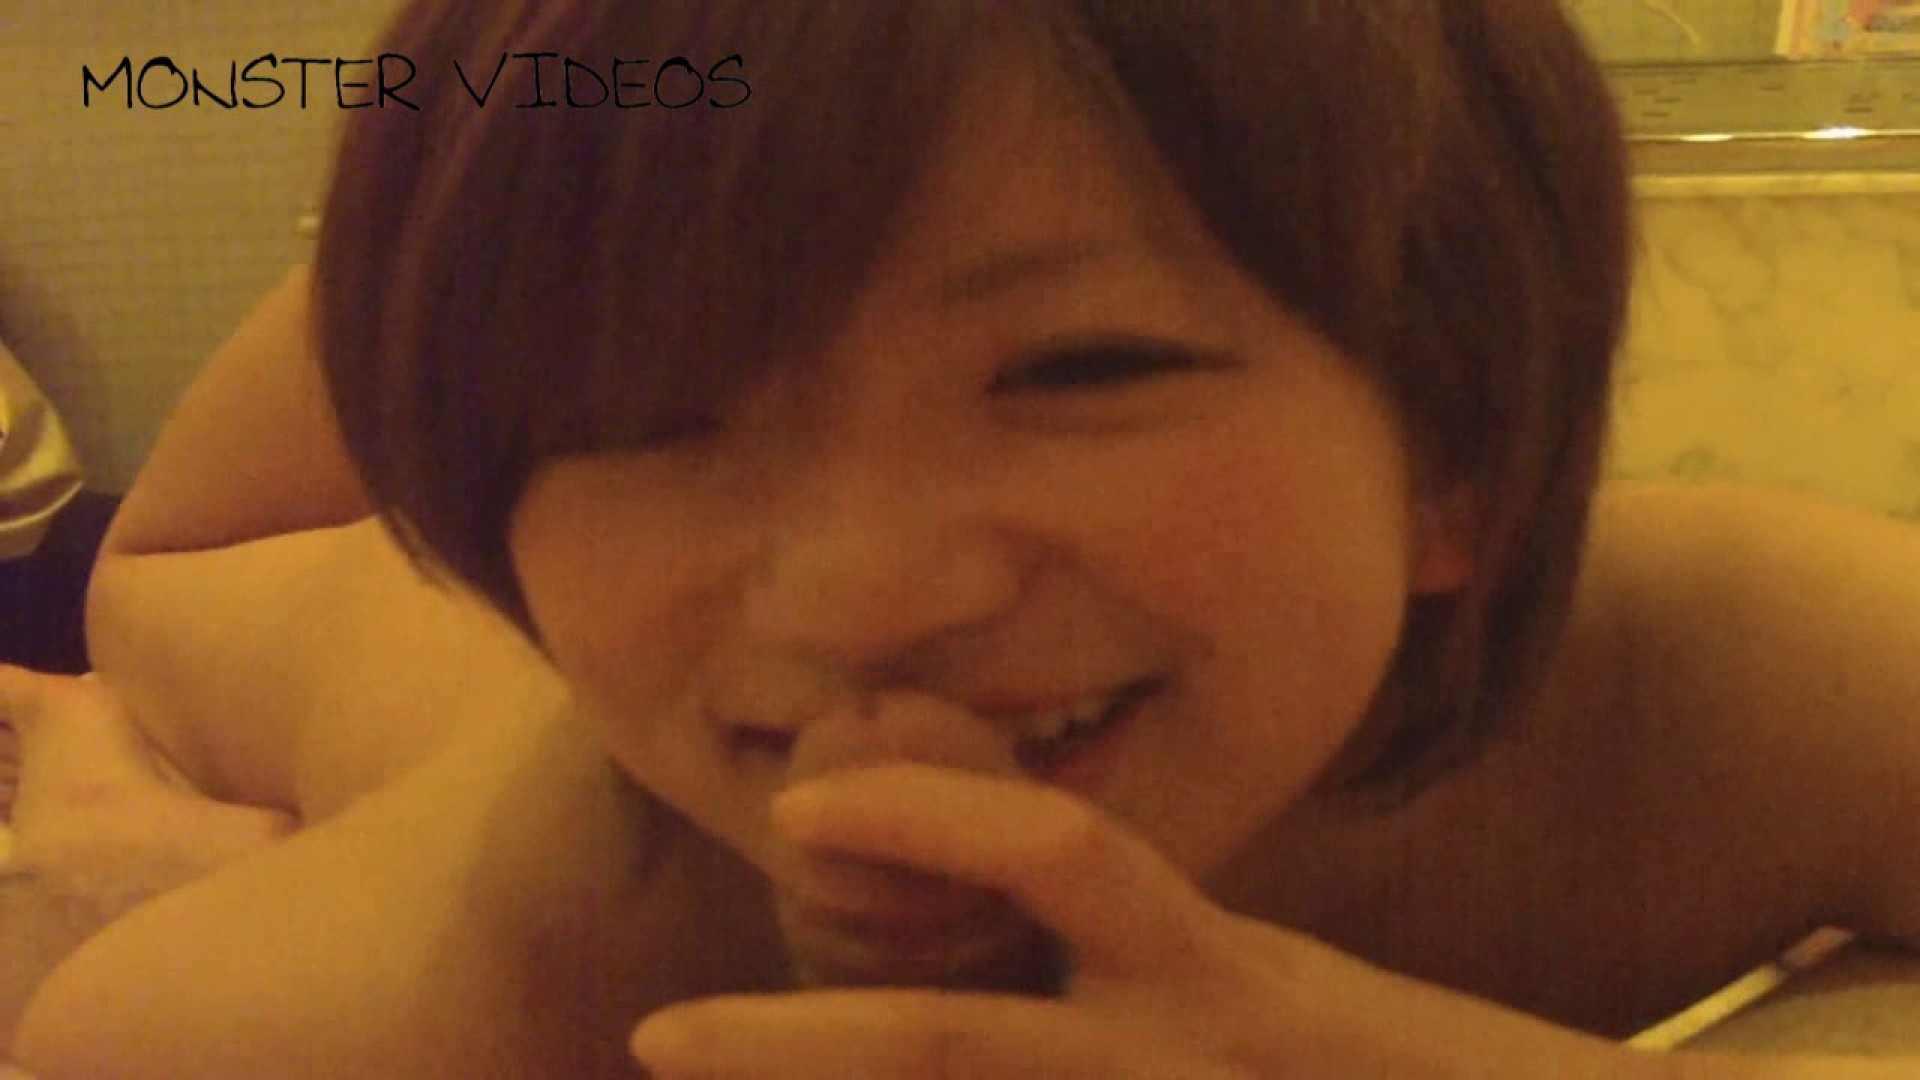 Hana嬢Private sexシリーズvol.1-2フェラ/挿入編 一般投稿 えろ無修正画像 109枚 48